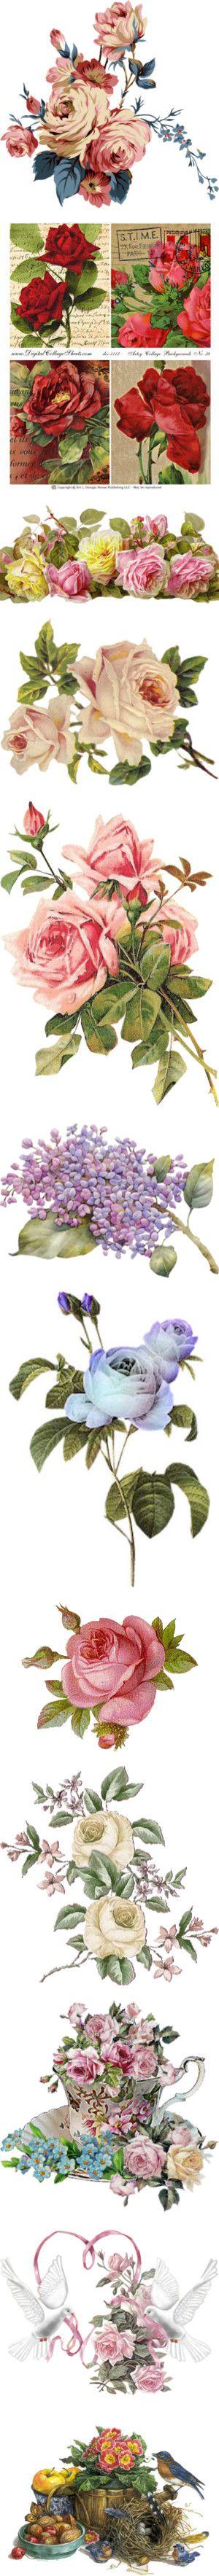 """Victorian Flowers"" by maneevanit ❤"